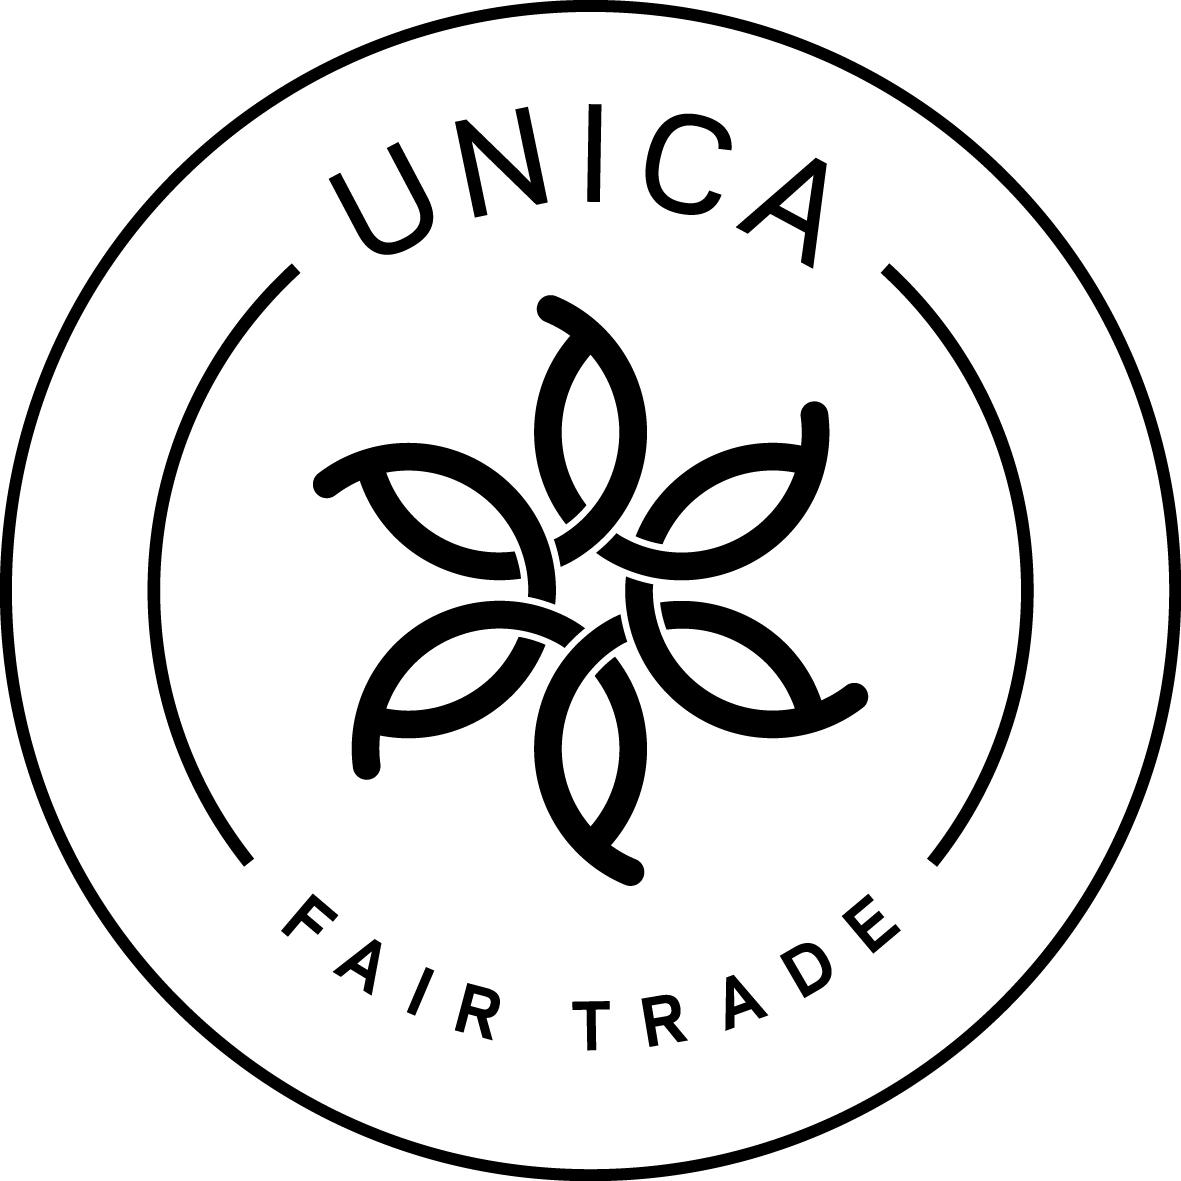 UNICA OFFICIAL BLACKjpg